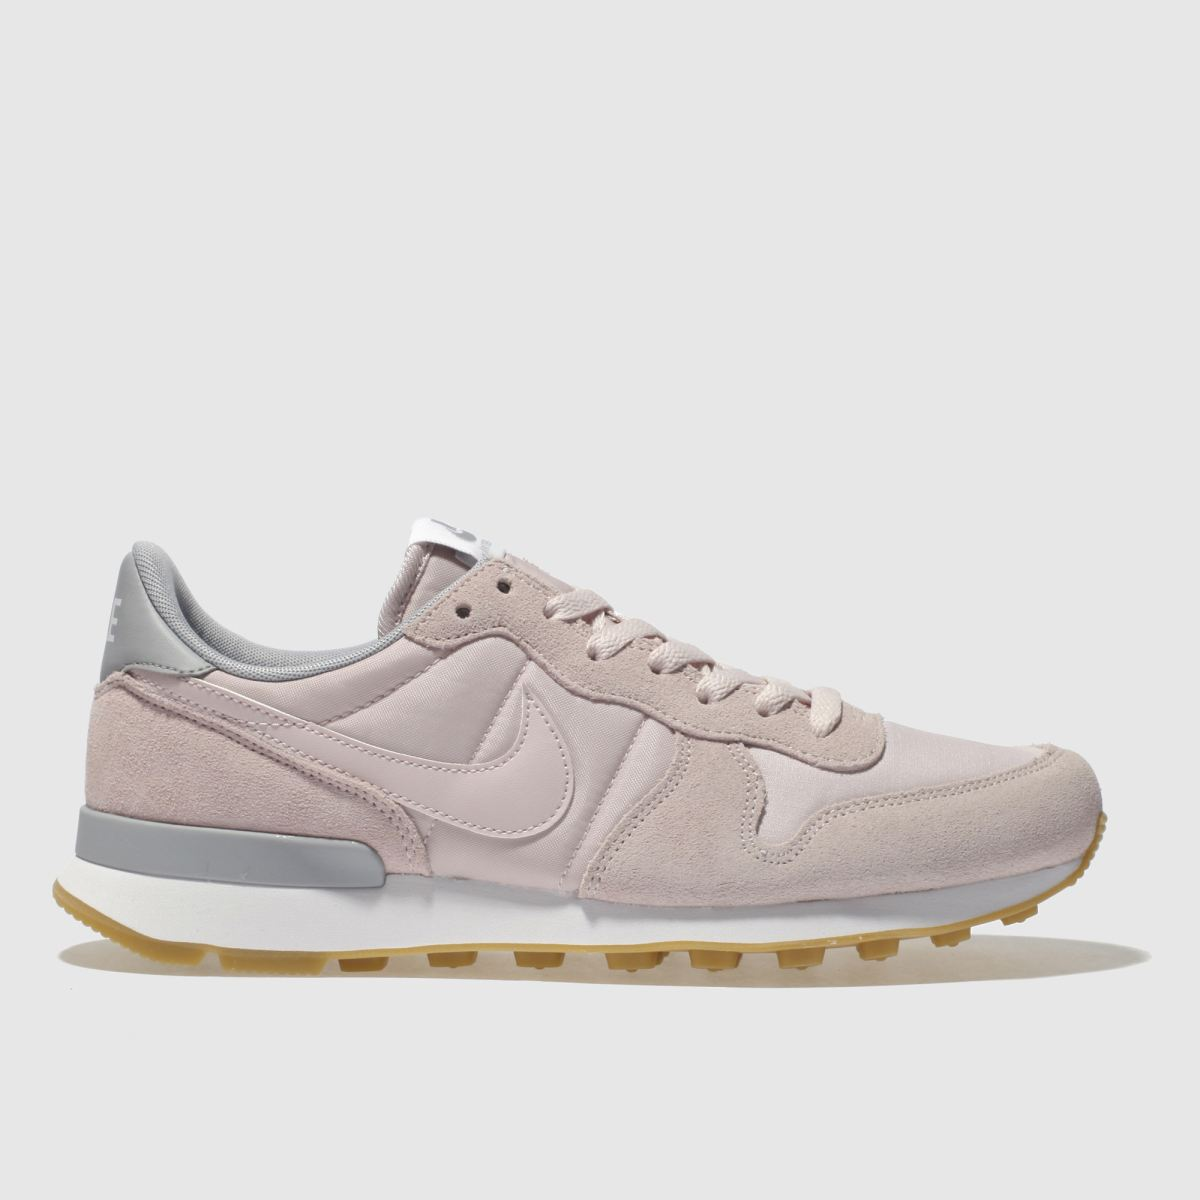 Nike Pale Pink Internationalist Trainers